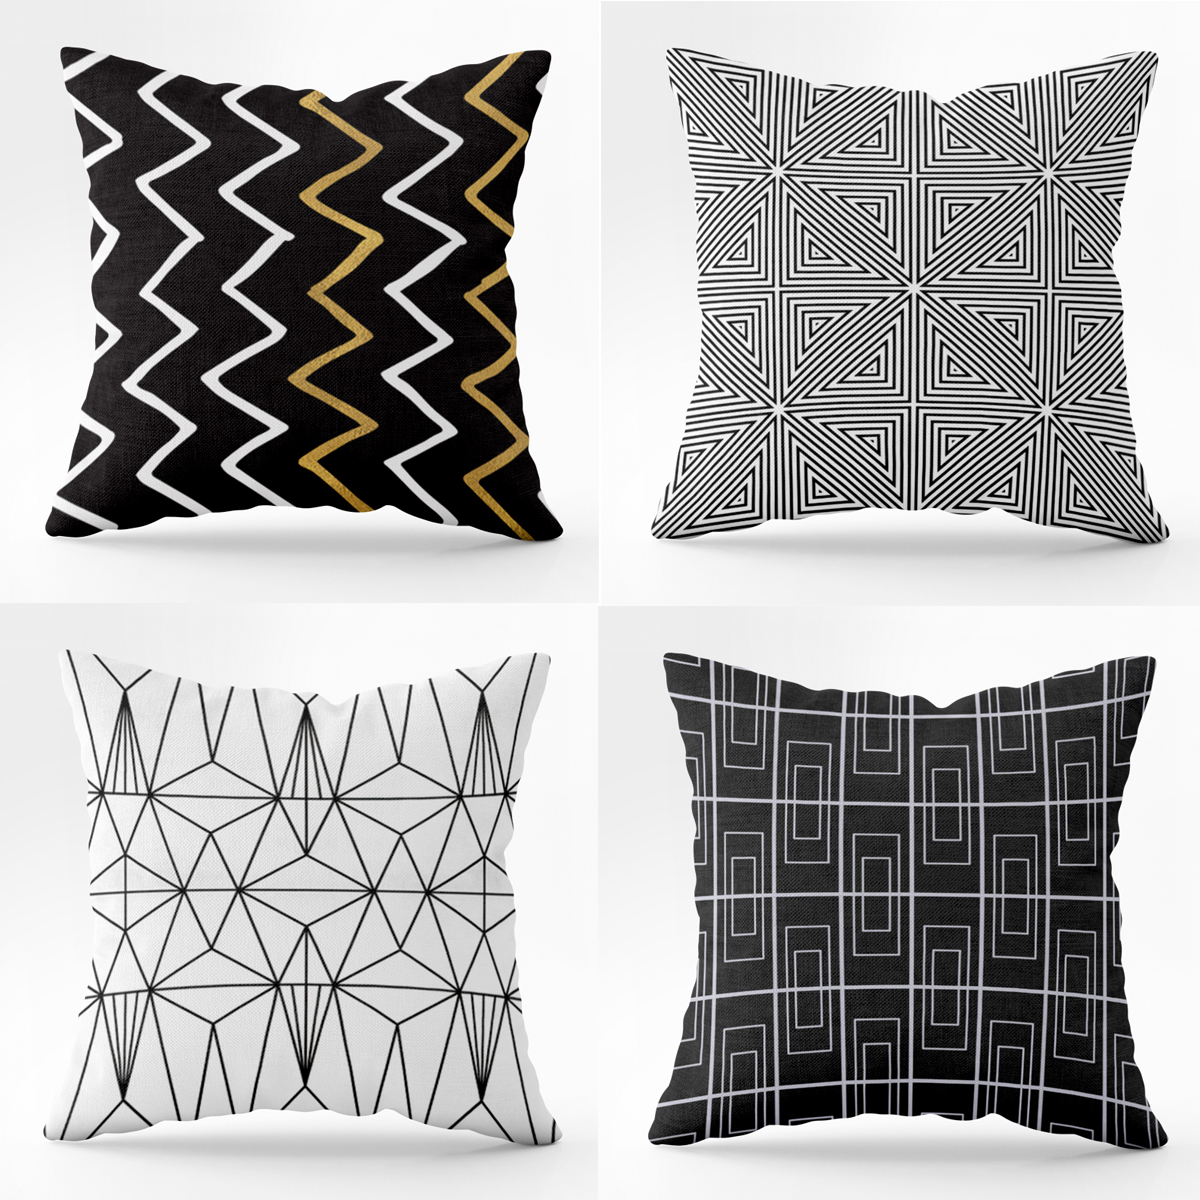 novashion boho pillow case black and white pattern pillowcase printed geometry euro pillow covers home decorative cushion cover walmart com